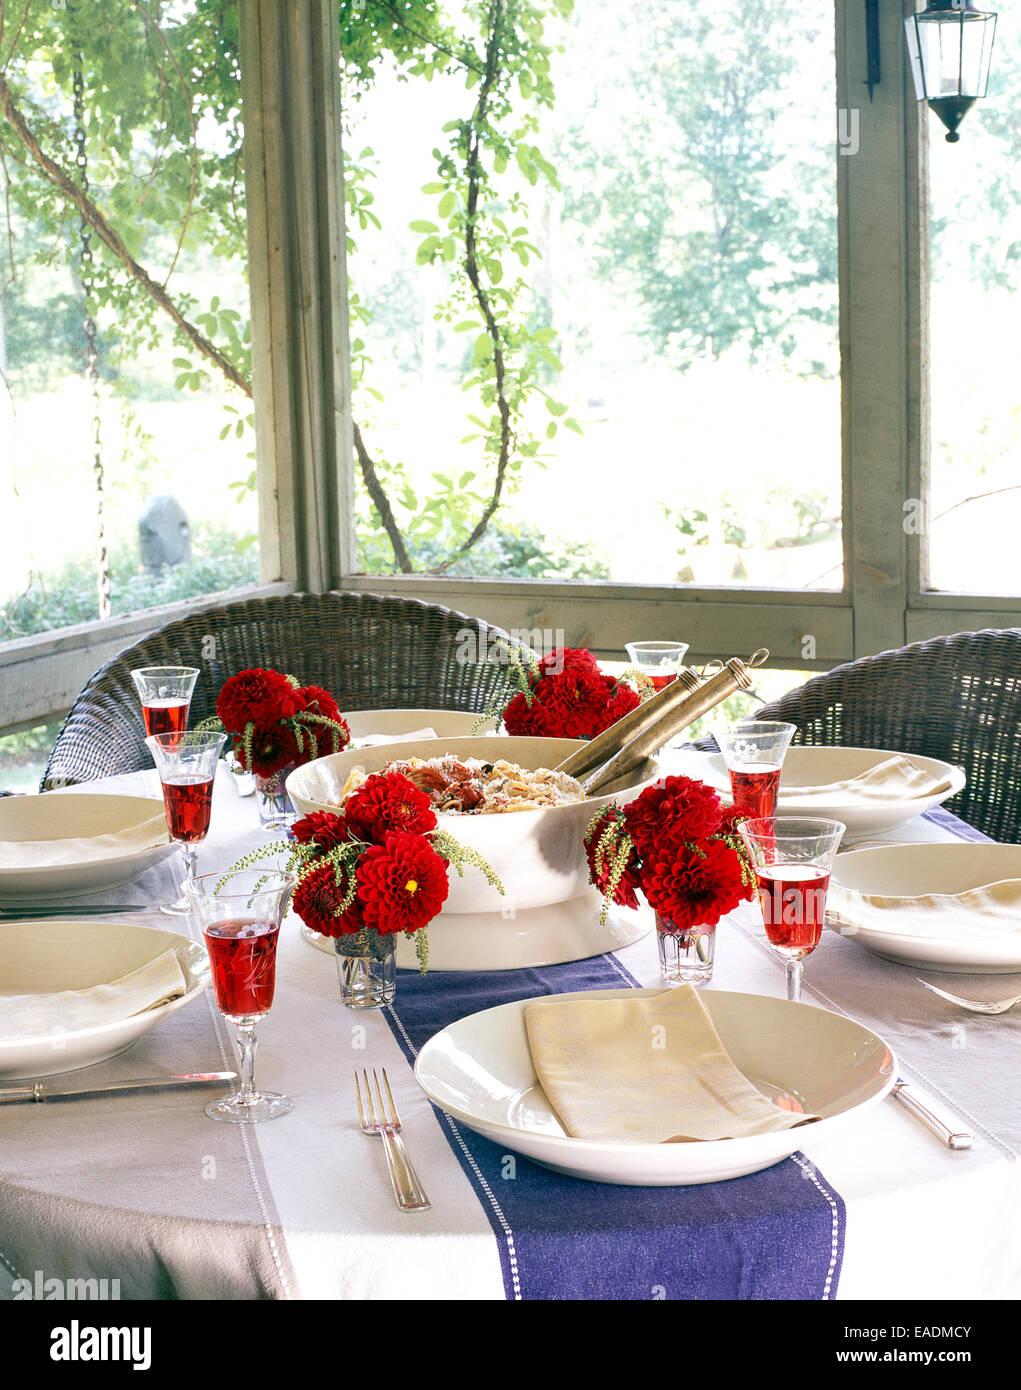 Sommer-essen am gedeckten Tisch in abgeschirmten Veranda Stockbild